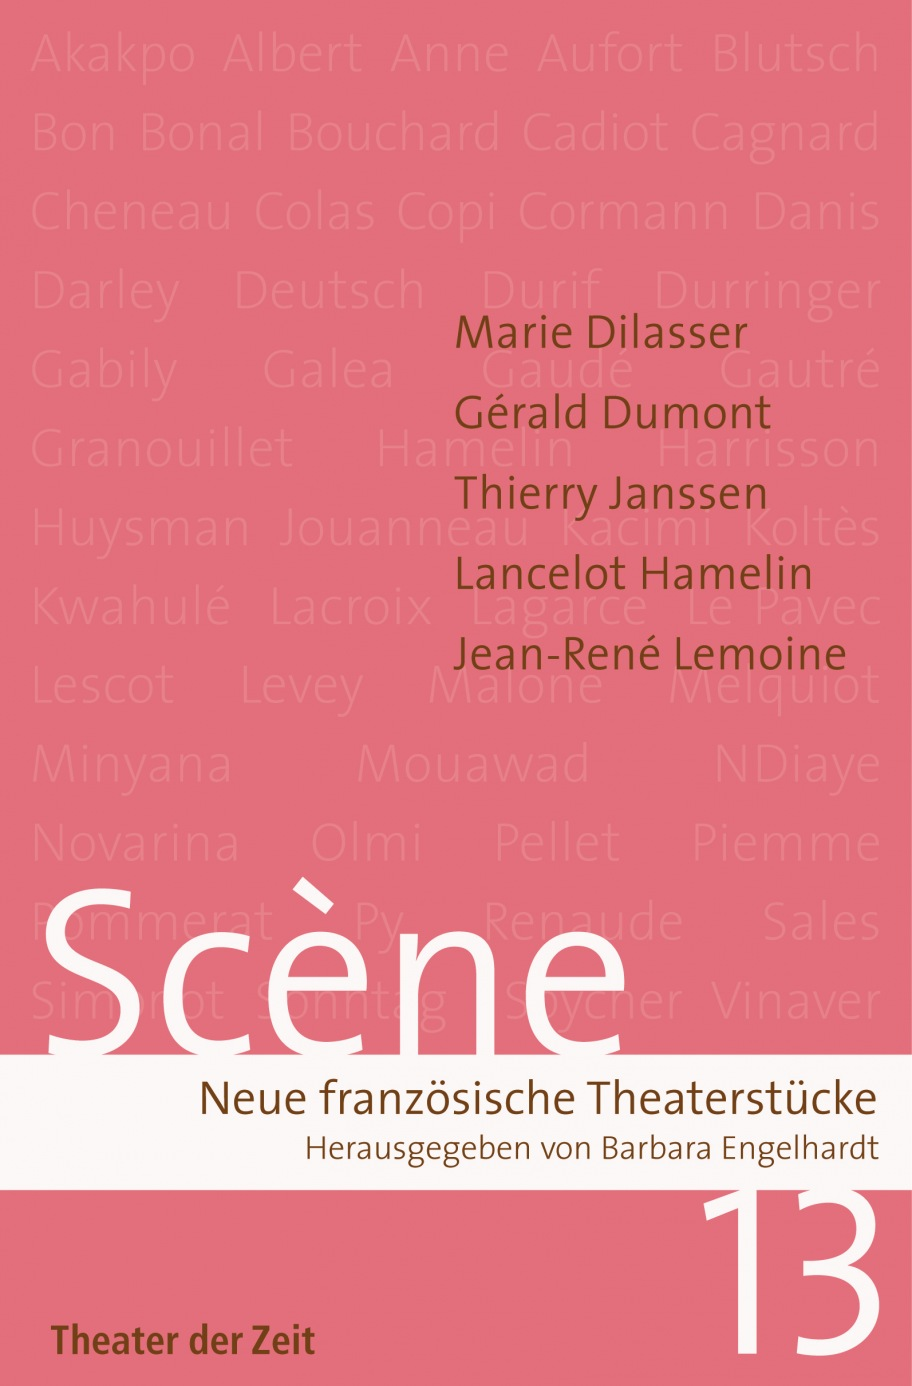 Scène 13